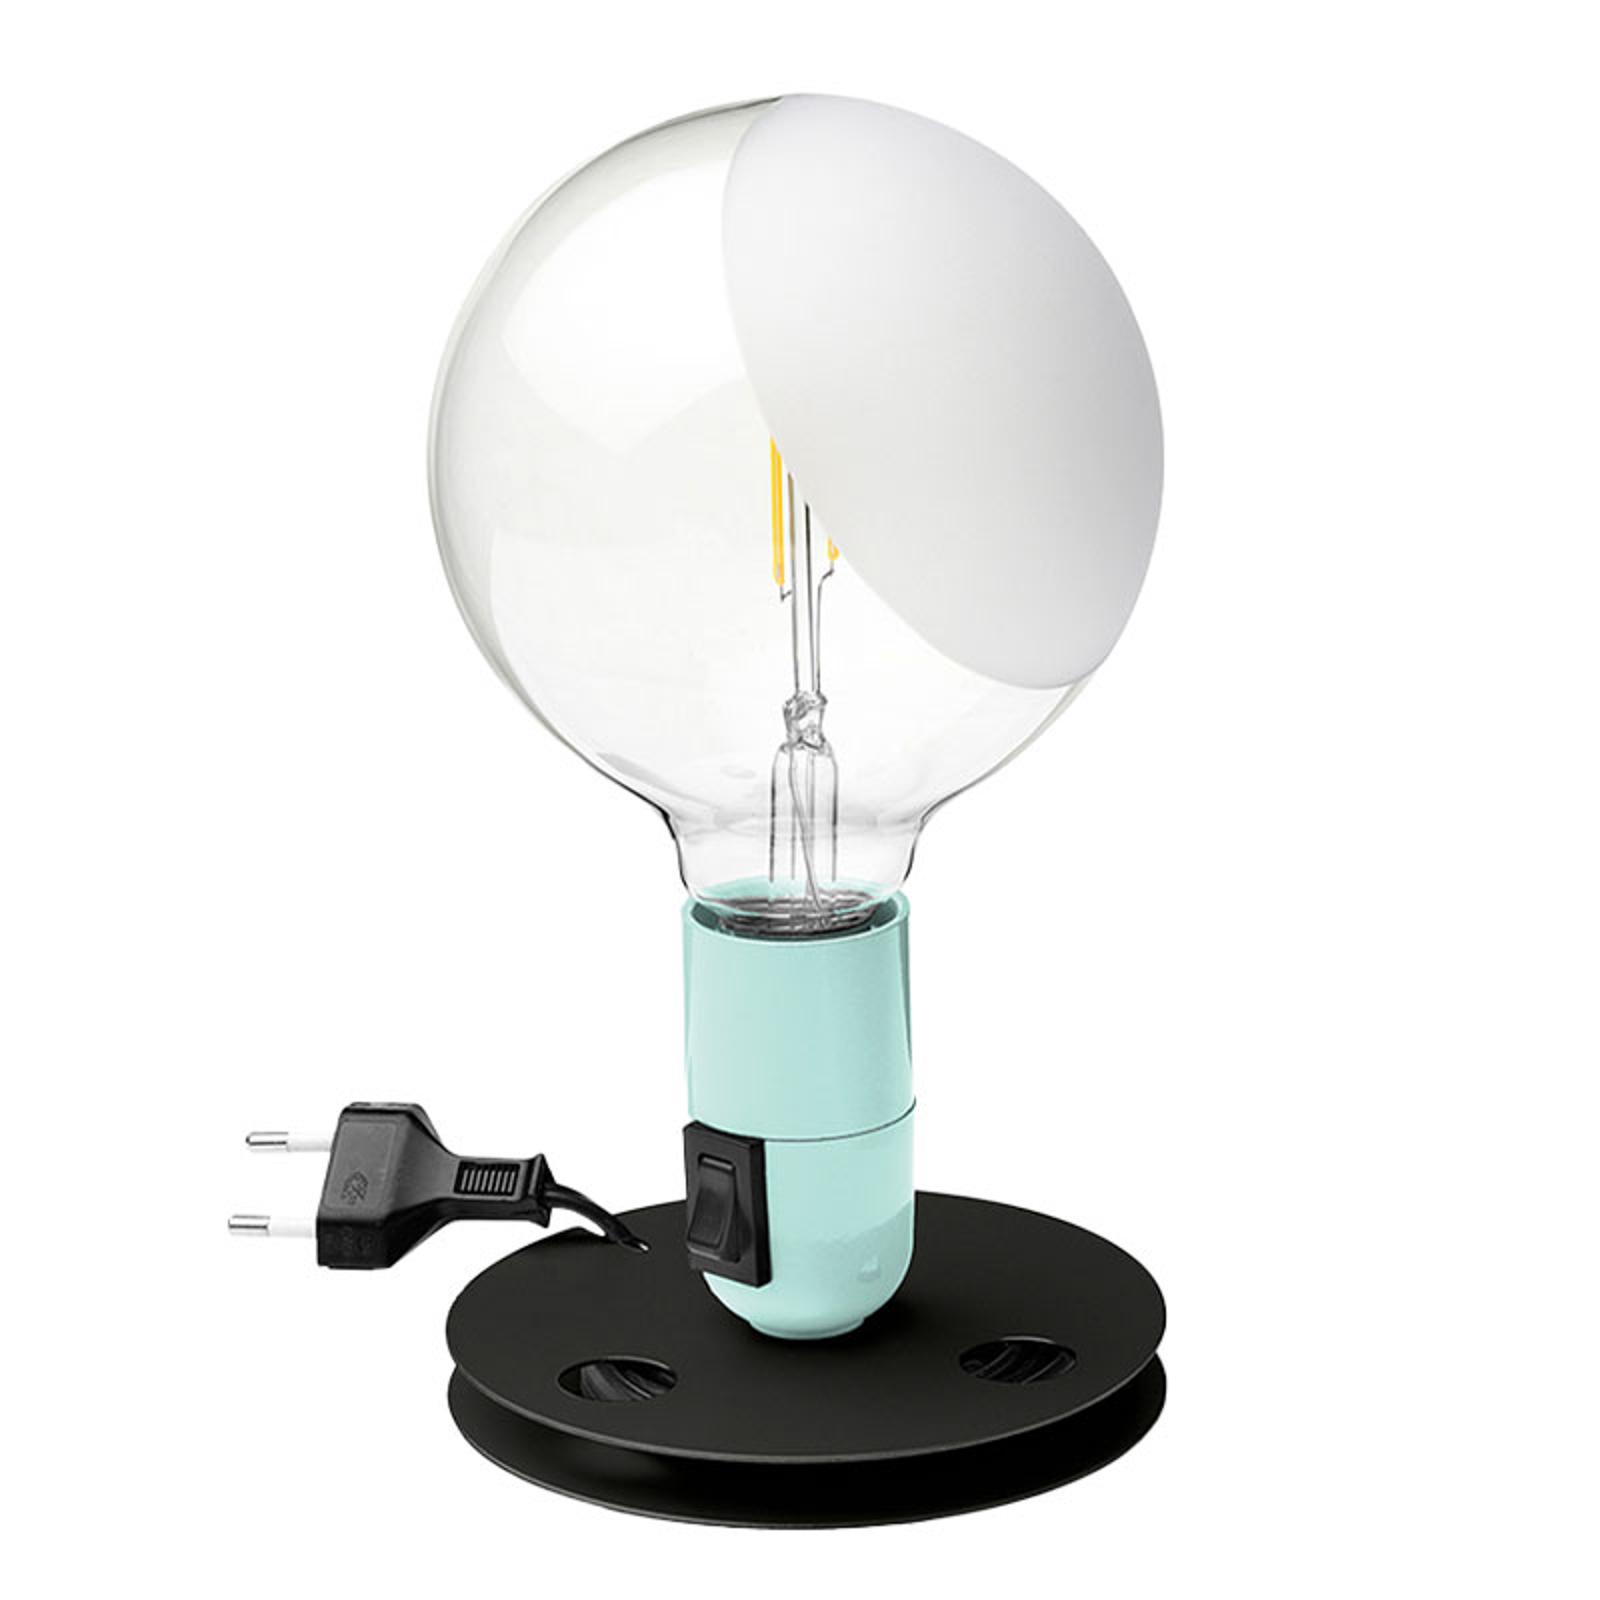 FLOS Lampadina LED da tavolo turchese, base nera